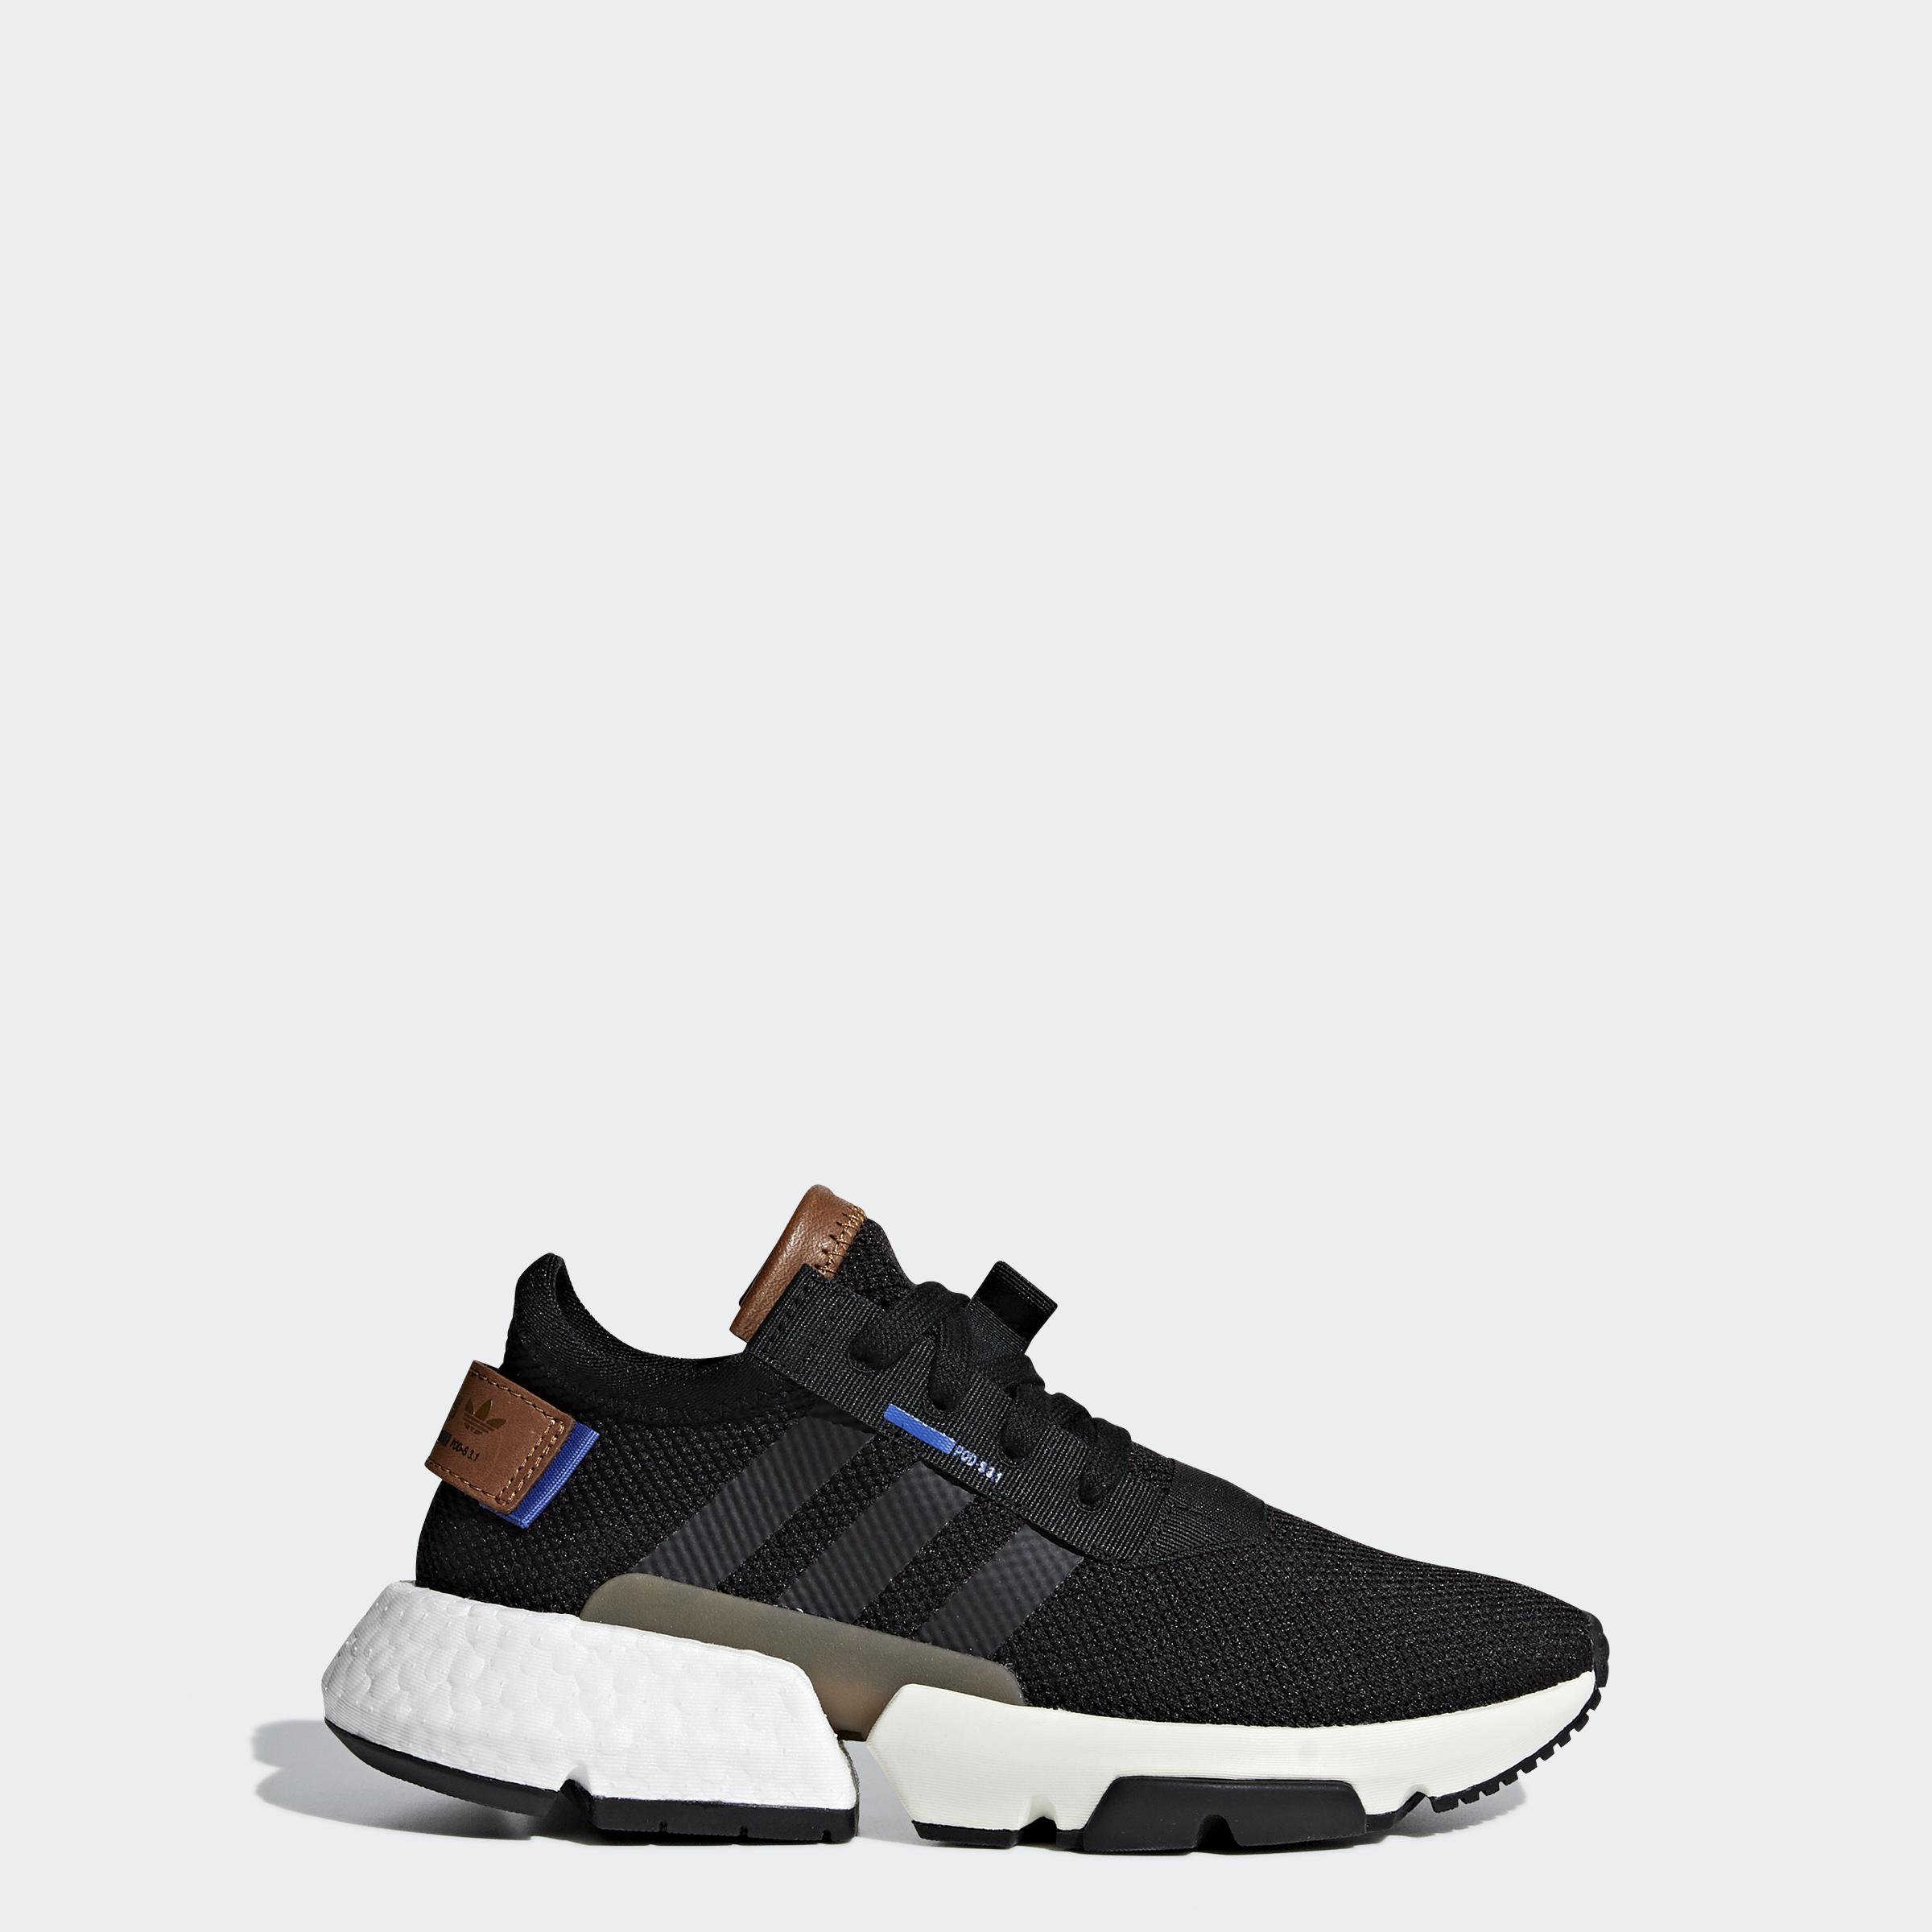 adidas-Originals-POD-S3-1-Shoes-Kids-039 thumbnail 16